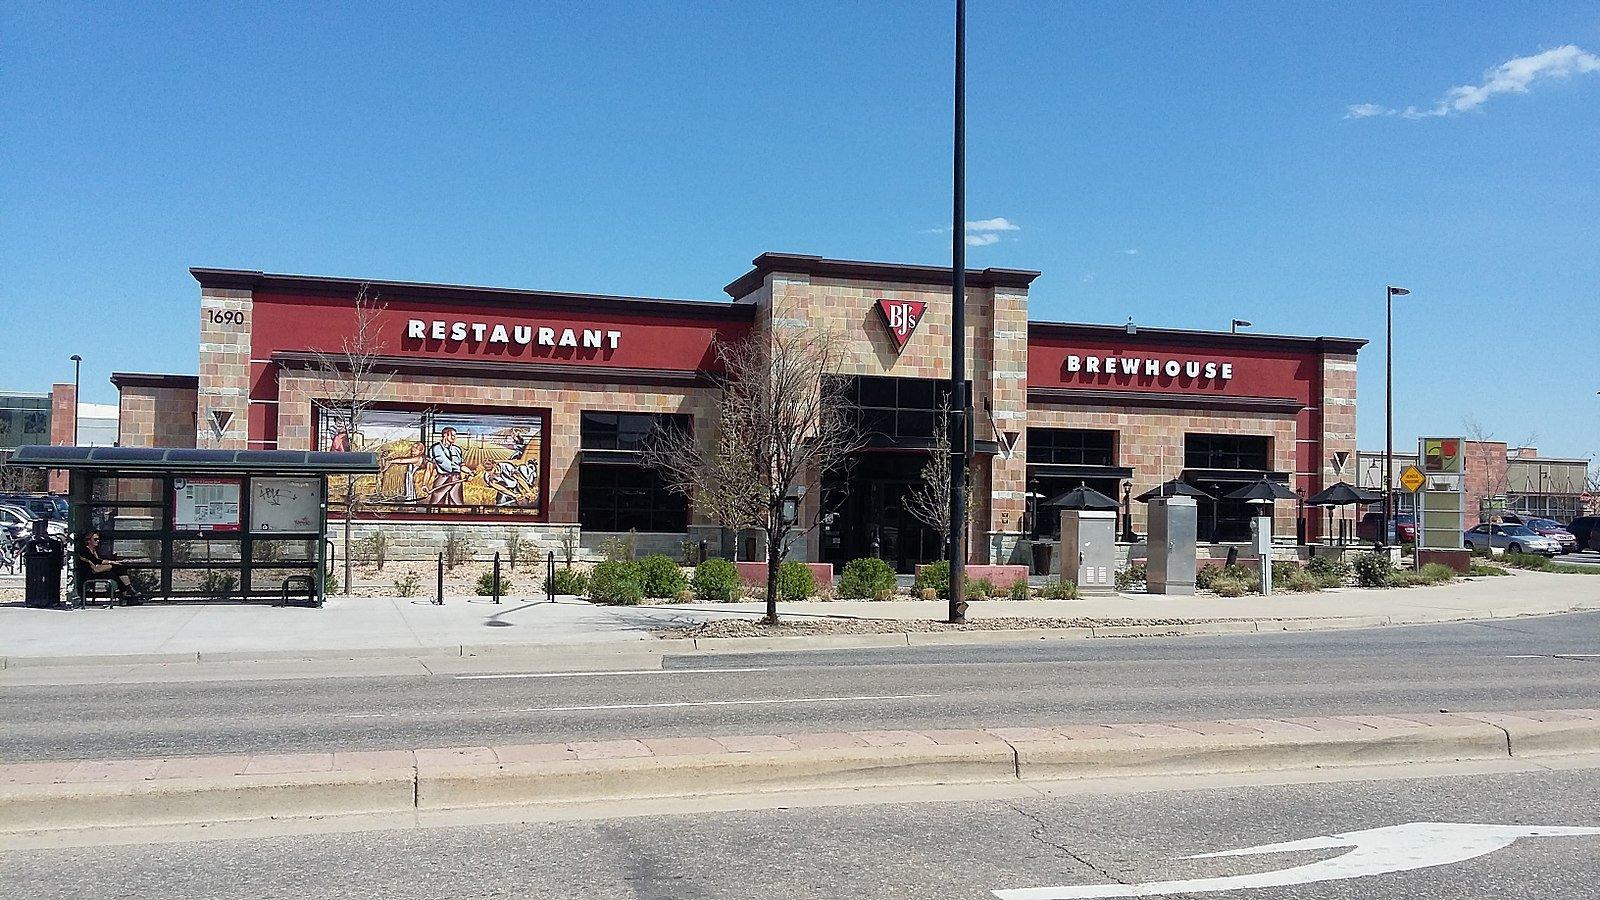 The Top 16 Best Chain Restaurants In America